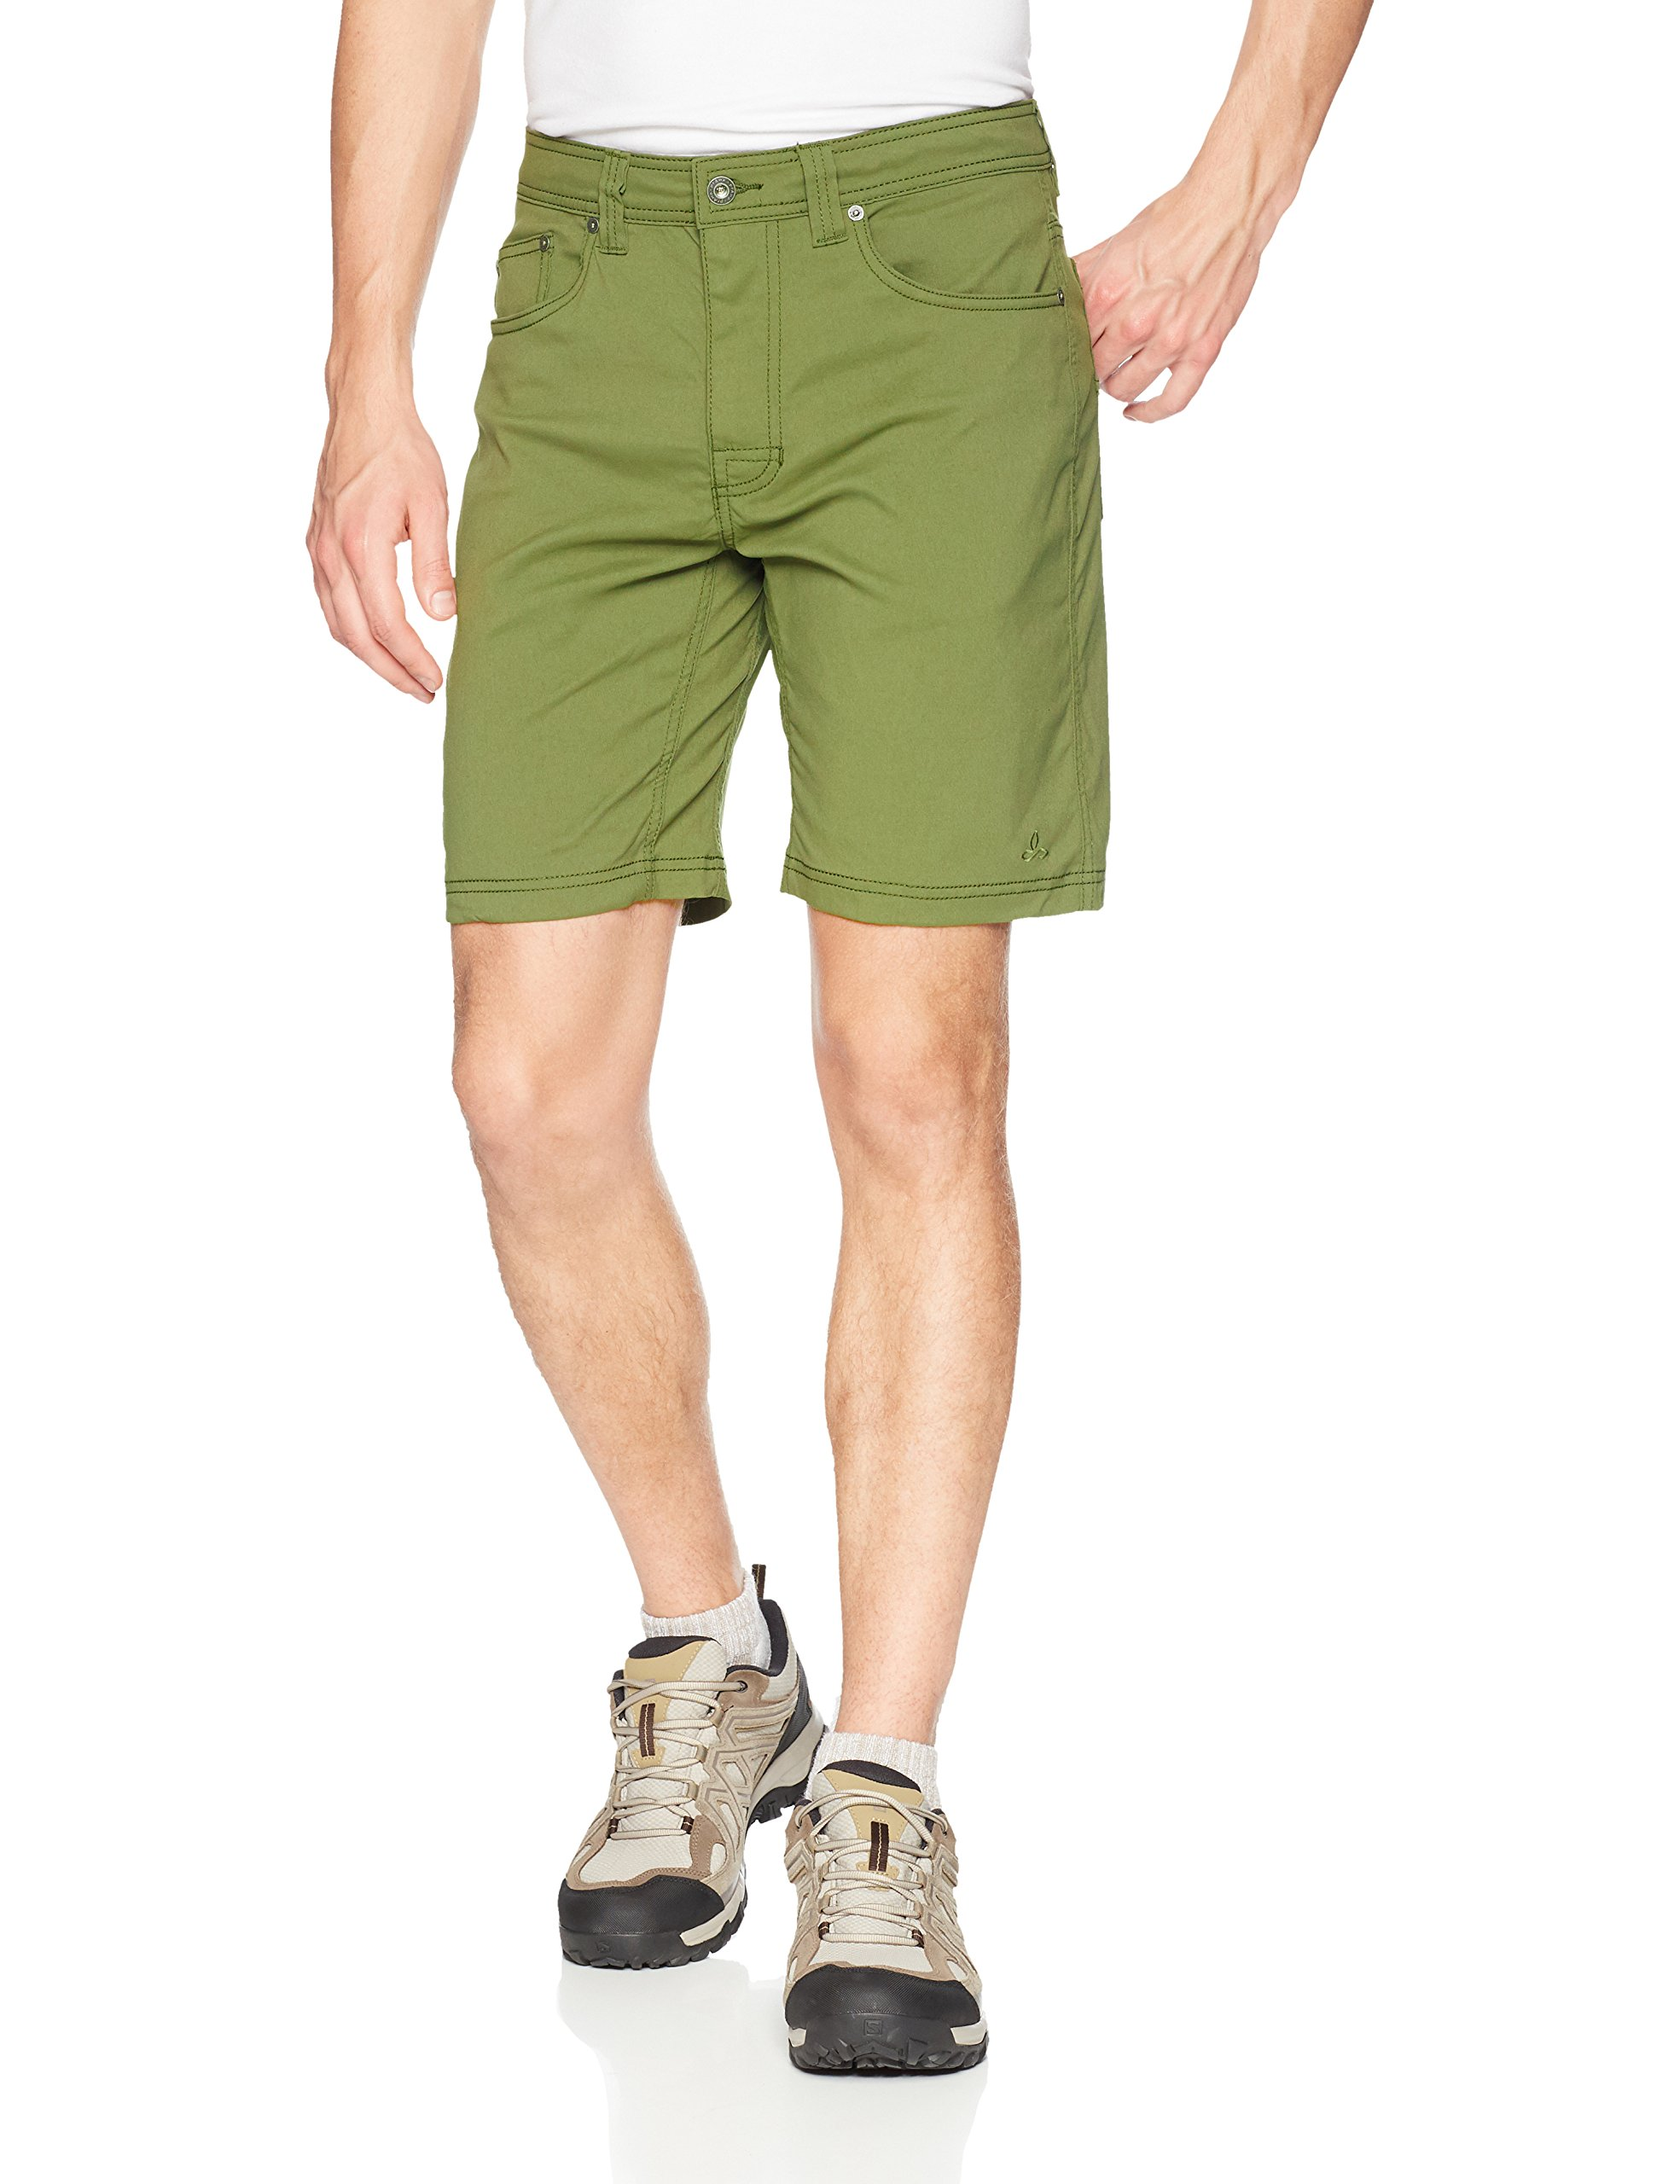 prAna Men's Brion Shorts, Cargo Green, 28W 9L